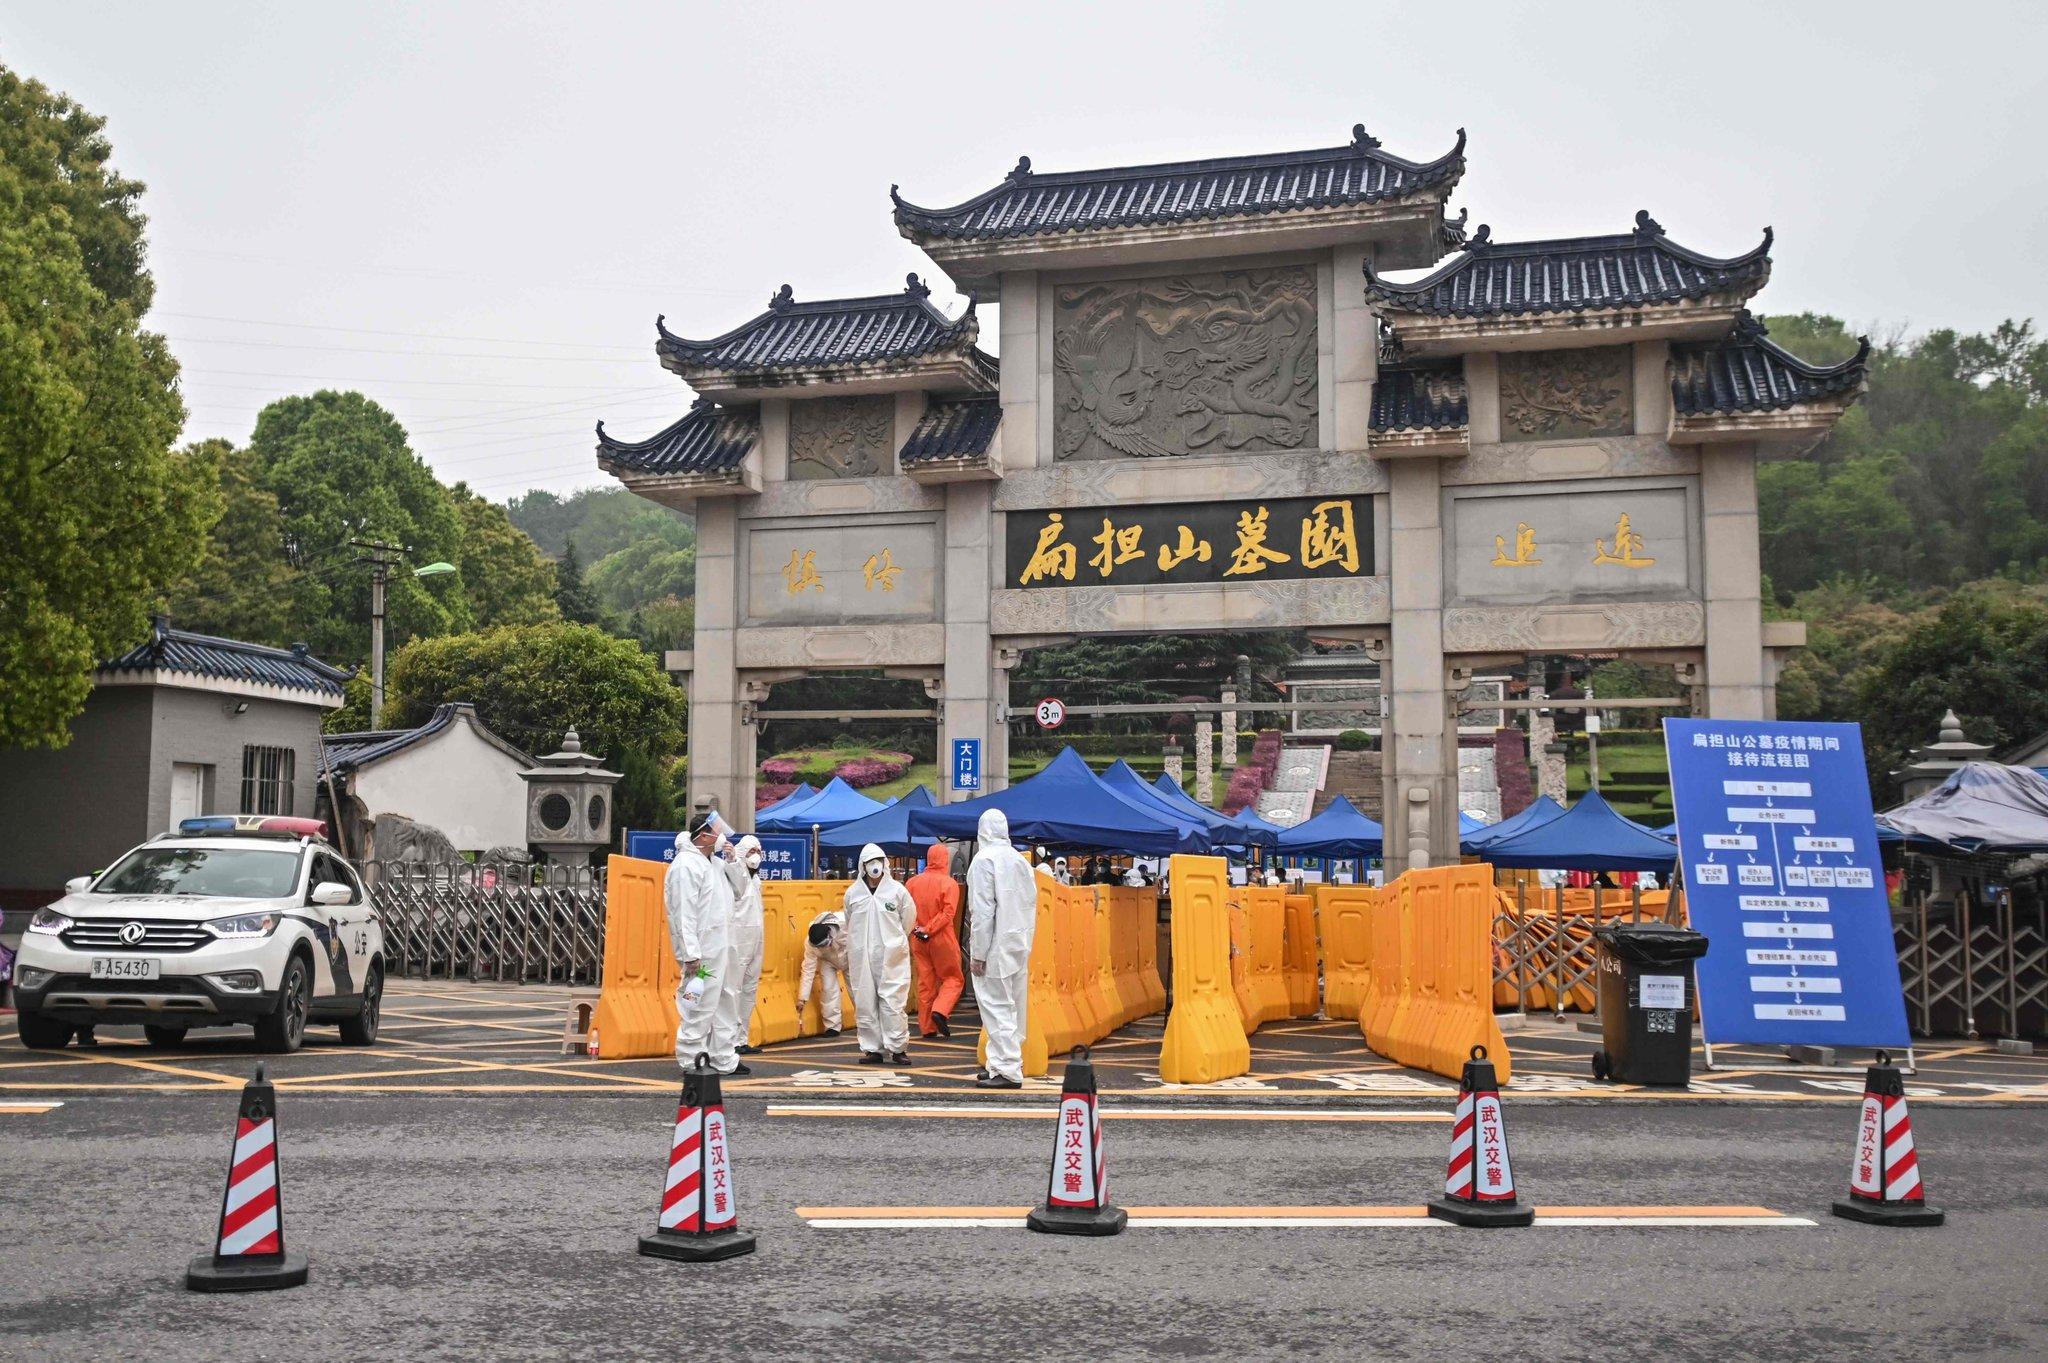 Wuhan Cemetary